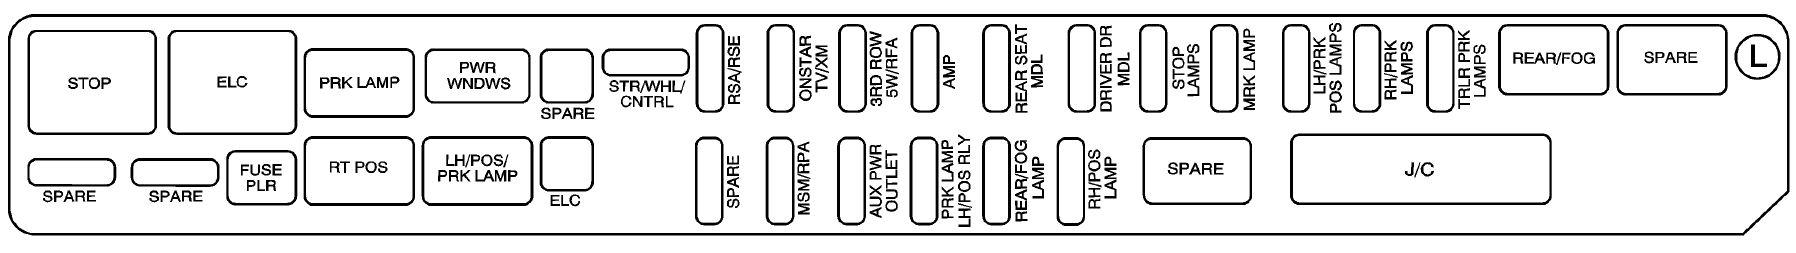 2008 Cadillac Srx Fuse Box - Schematics Data Wiring Diagrams \u2022